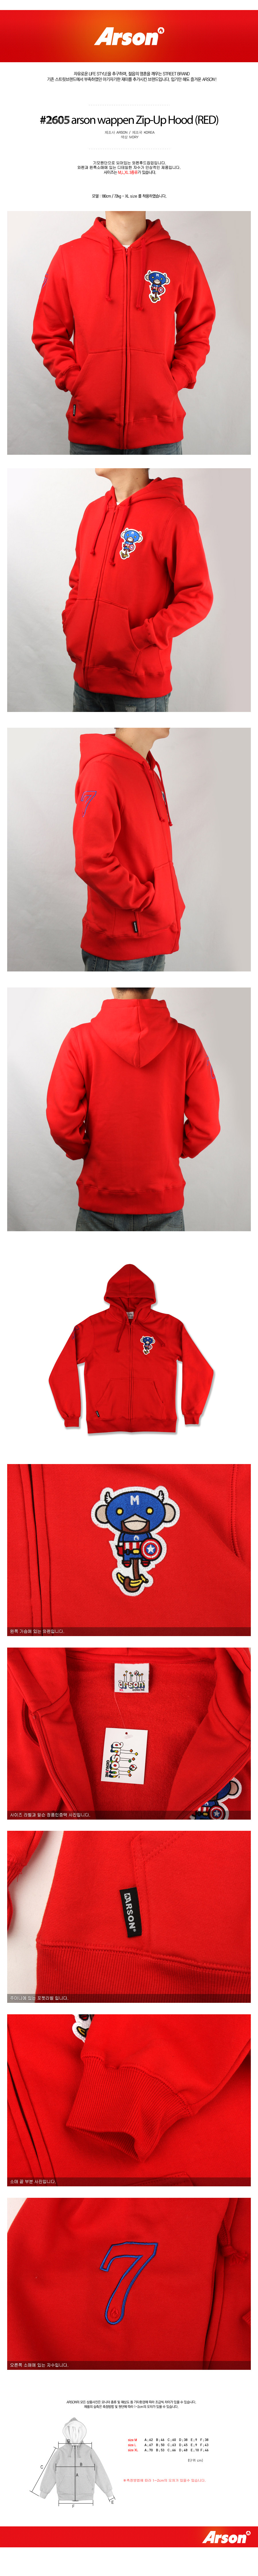 [ ARSON ] [ARSON] J2605 arson HOOD TEE zip up hoodie